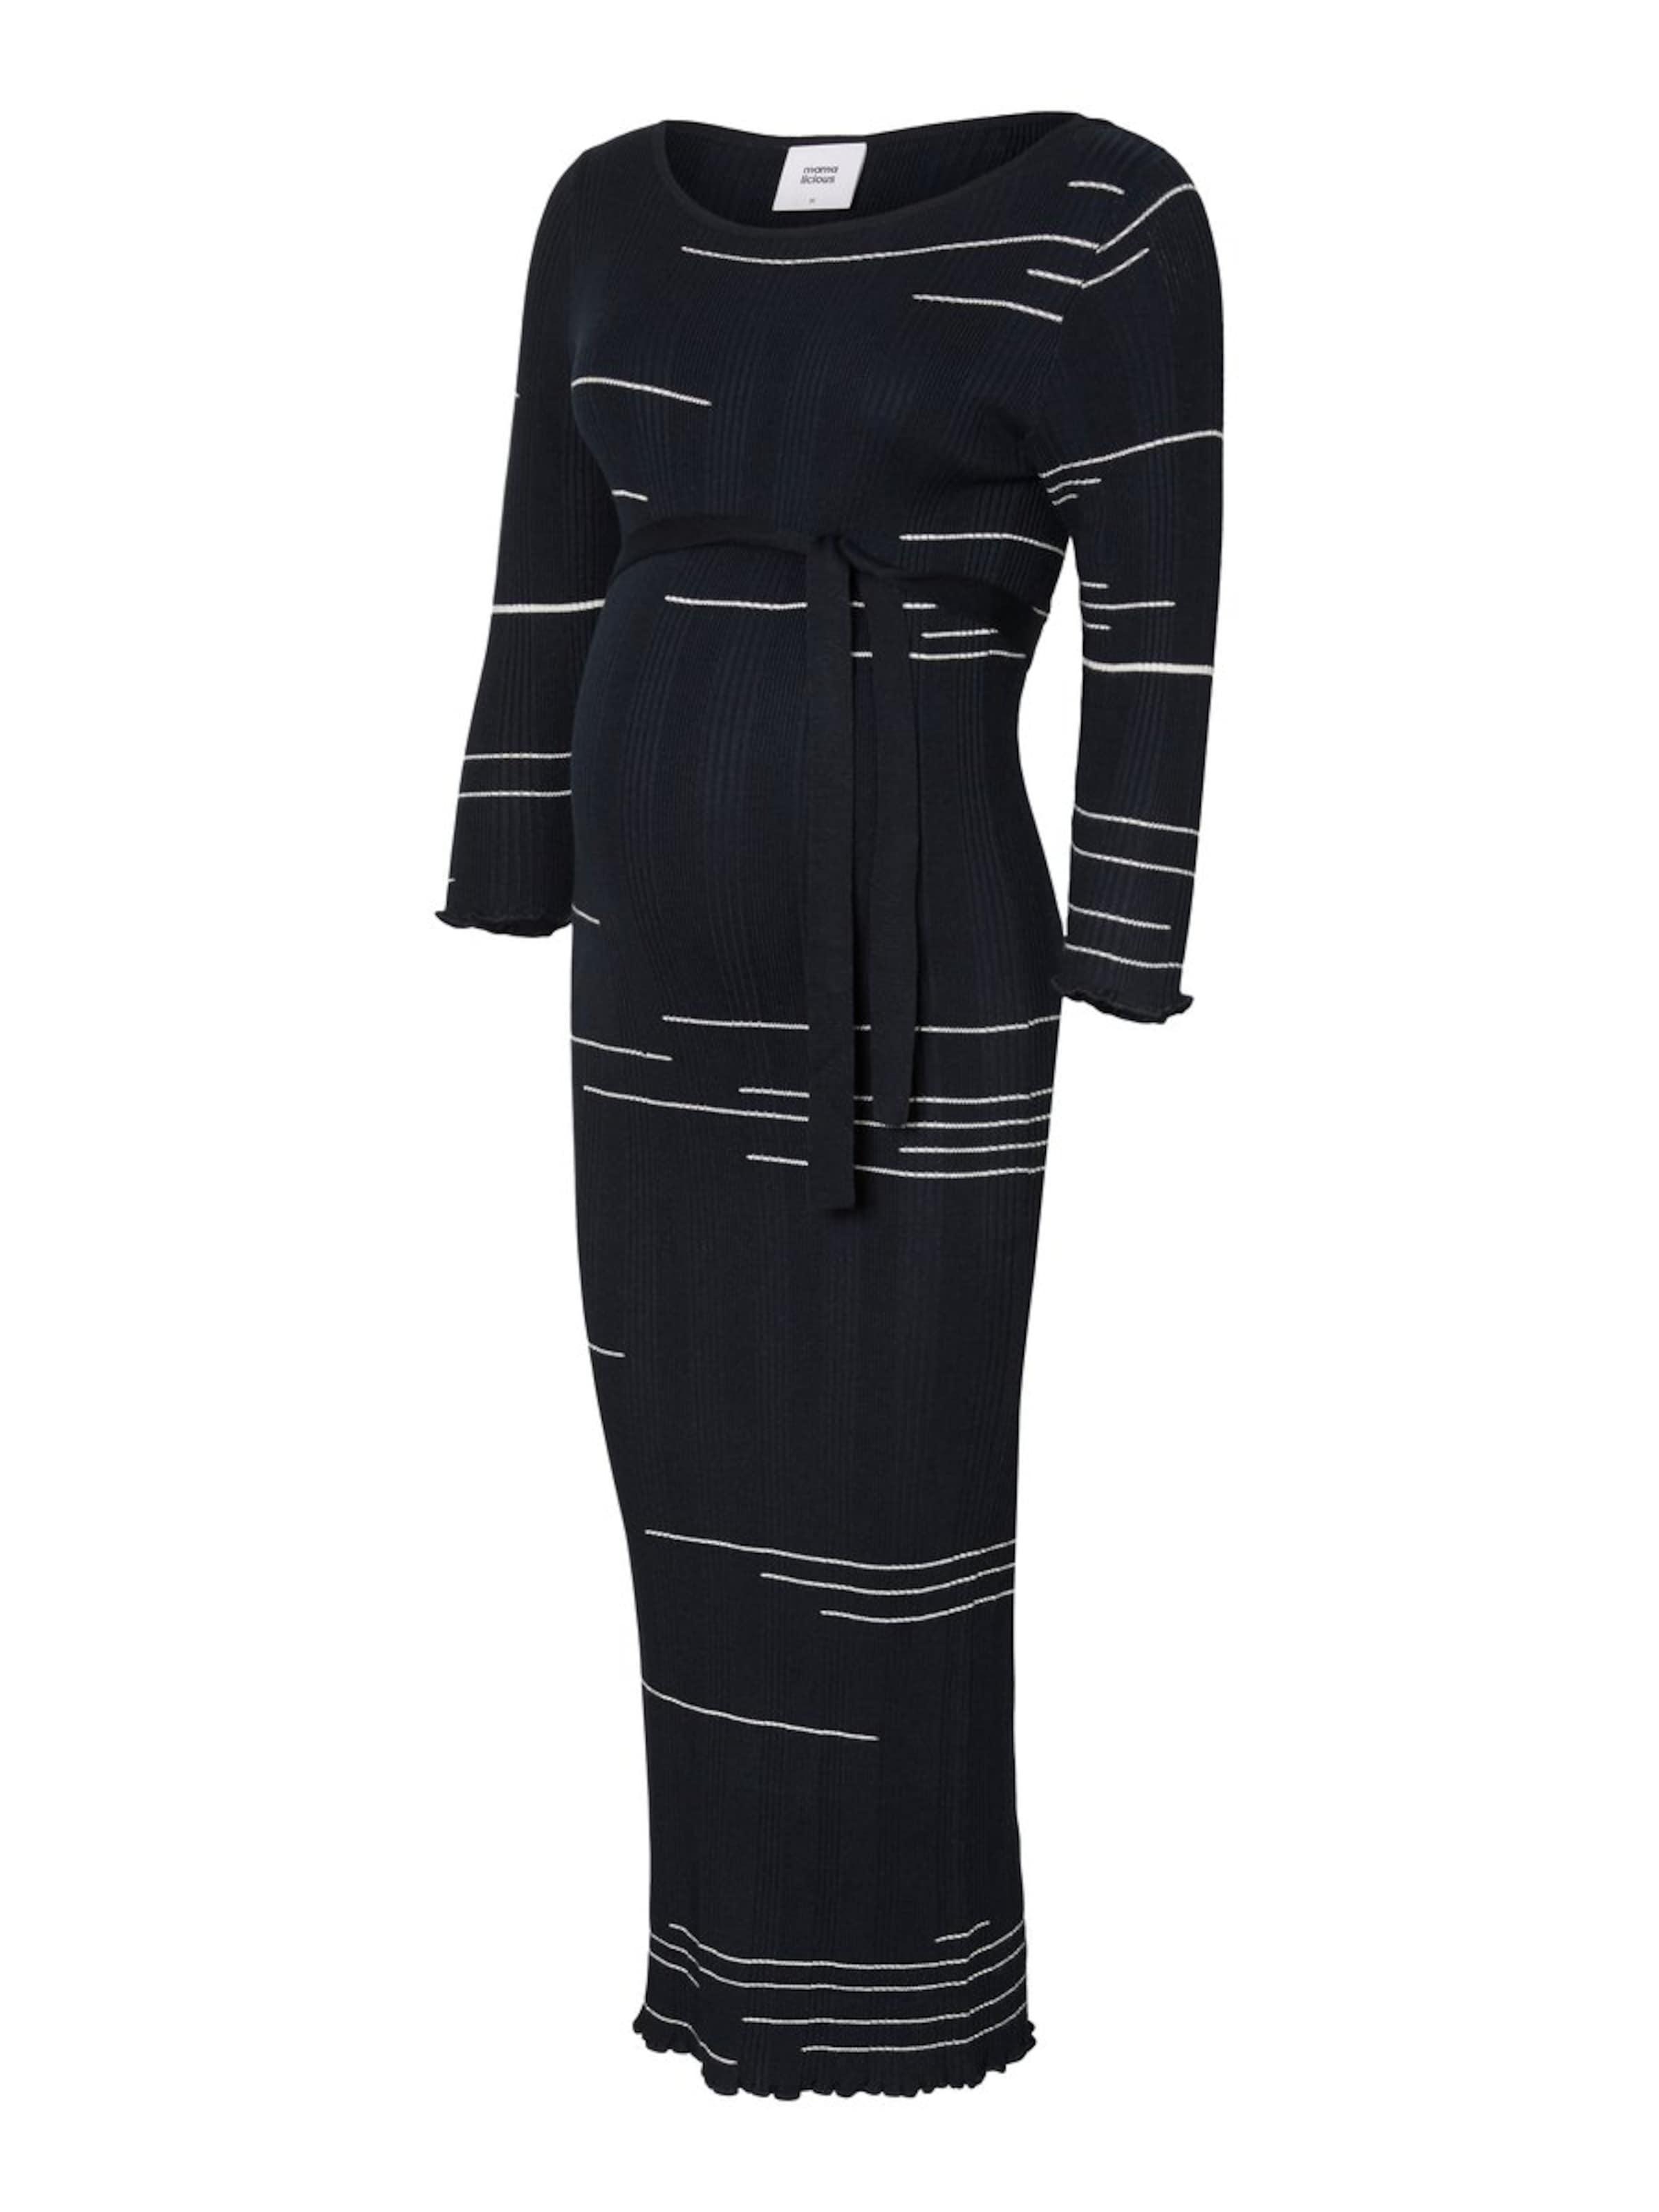 Bleu Mamalicious Robes En FoncéBlanc Maille UqGVMSpz